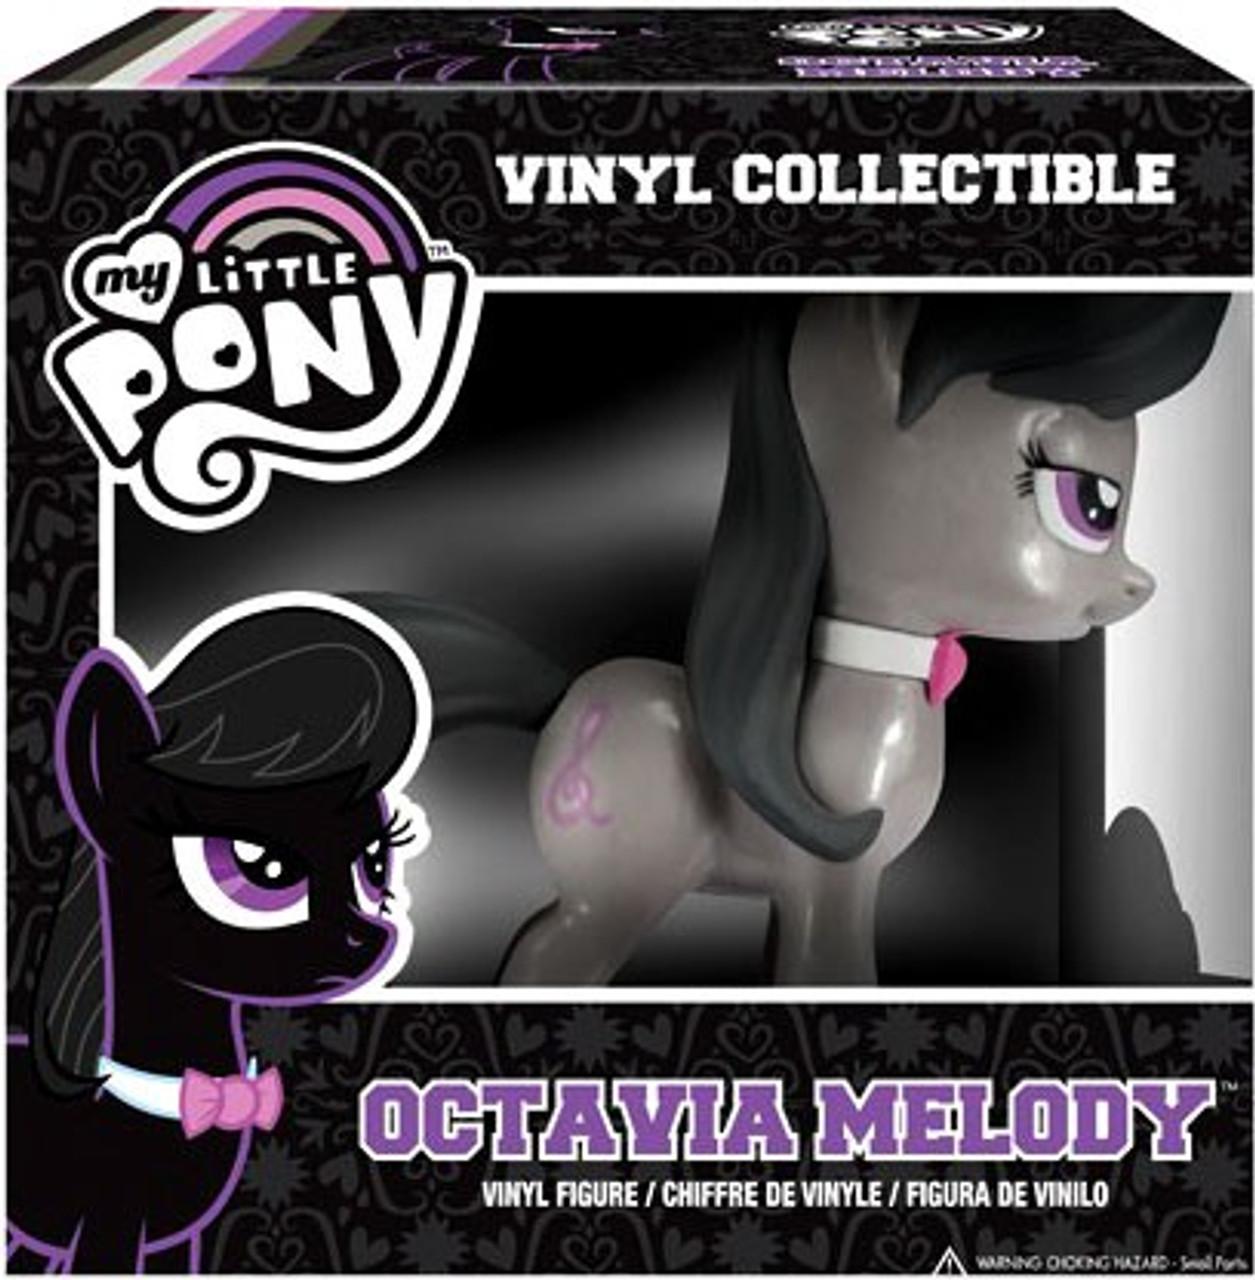 Funko My Little Pony Vinyl Collectibles Octavia Vinyl Figure